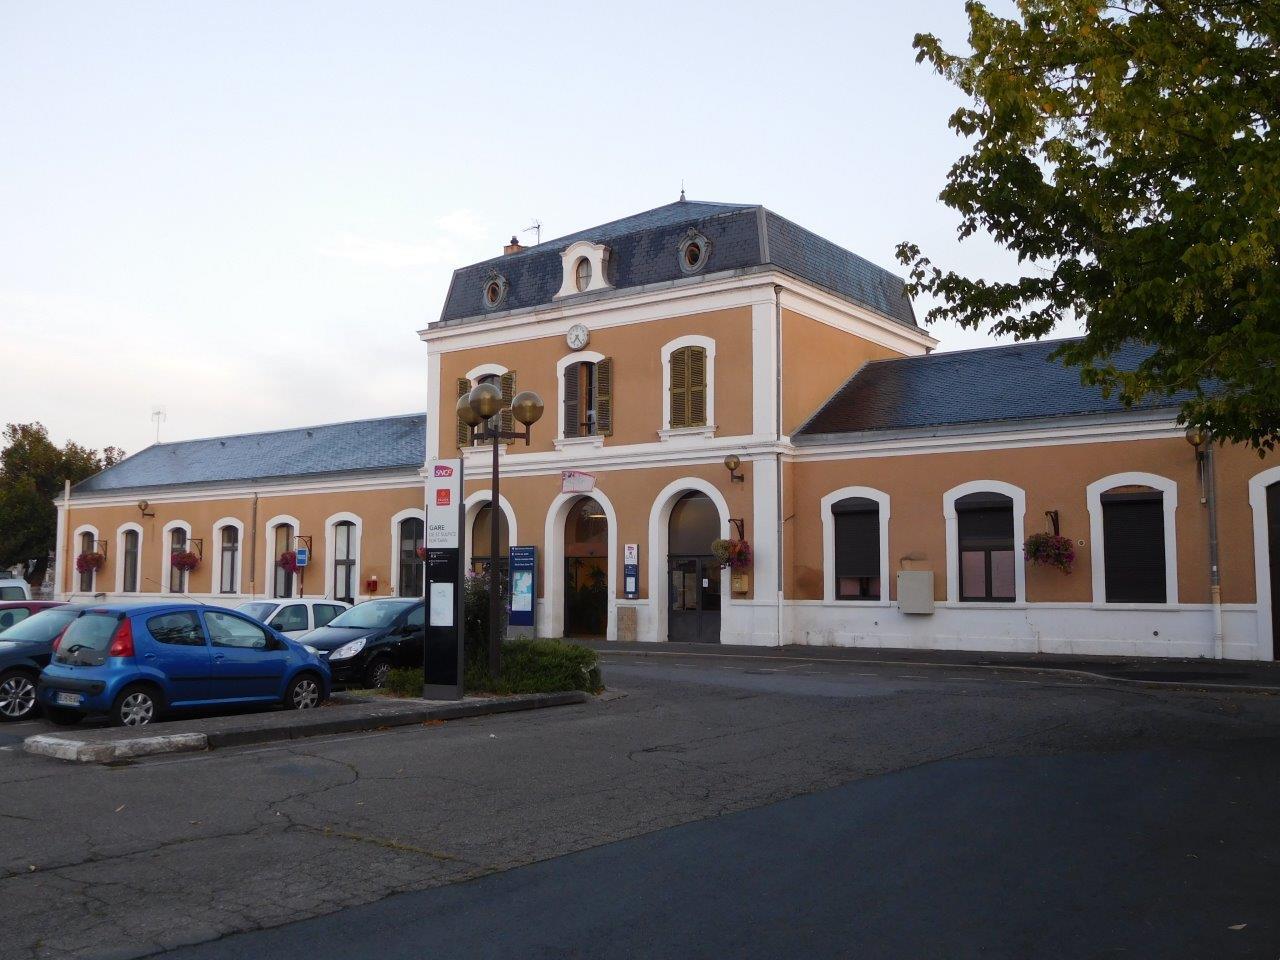 gare-de-saint-sulpice-sur-tarn-train-station